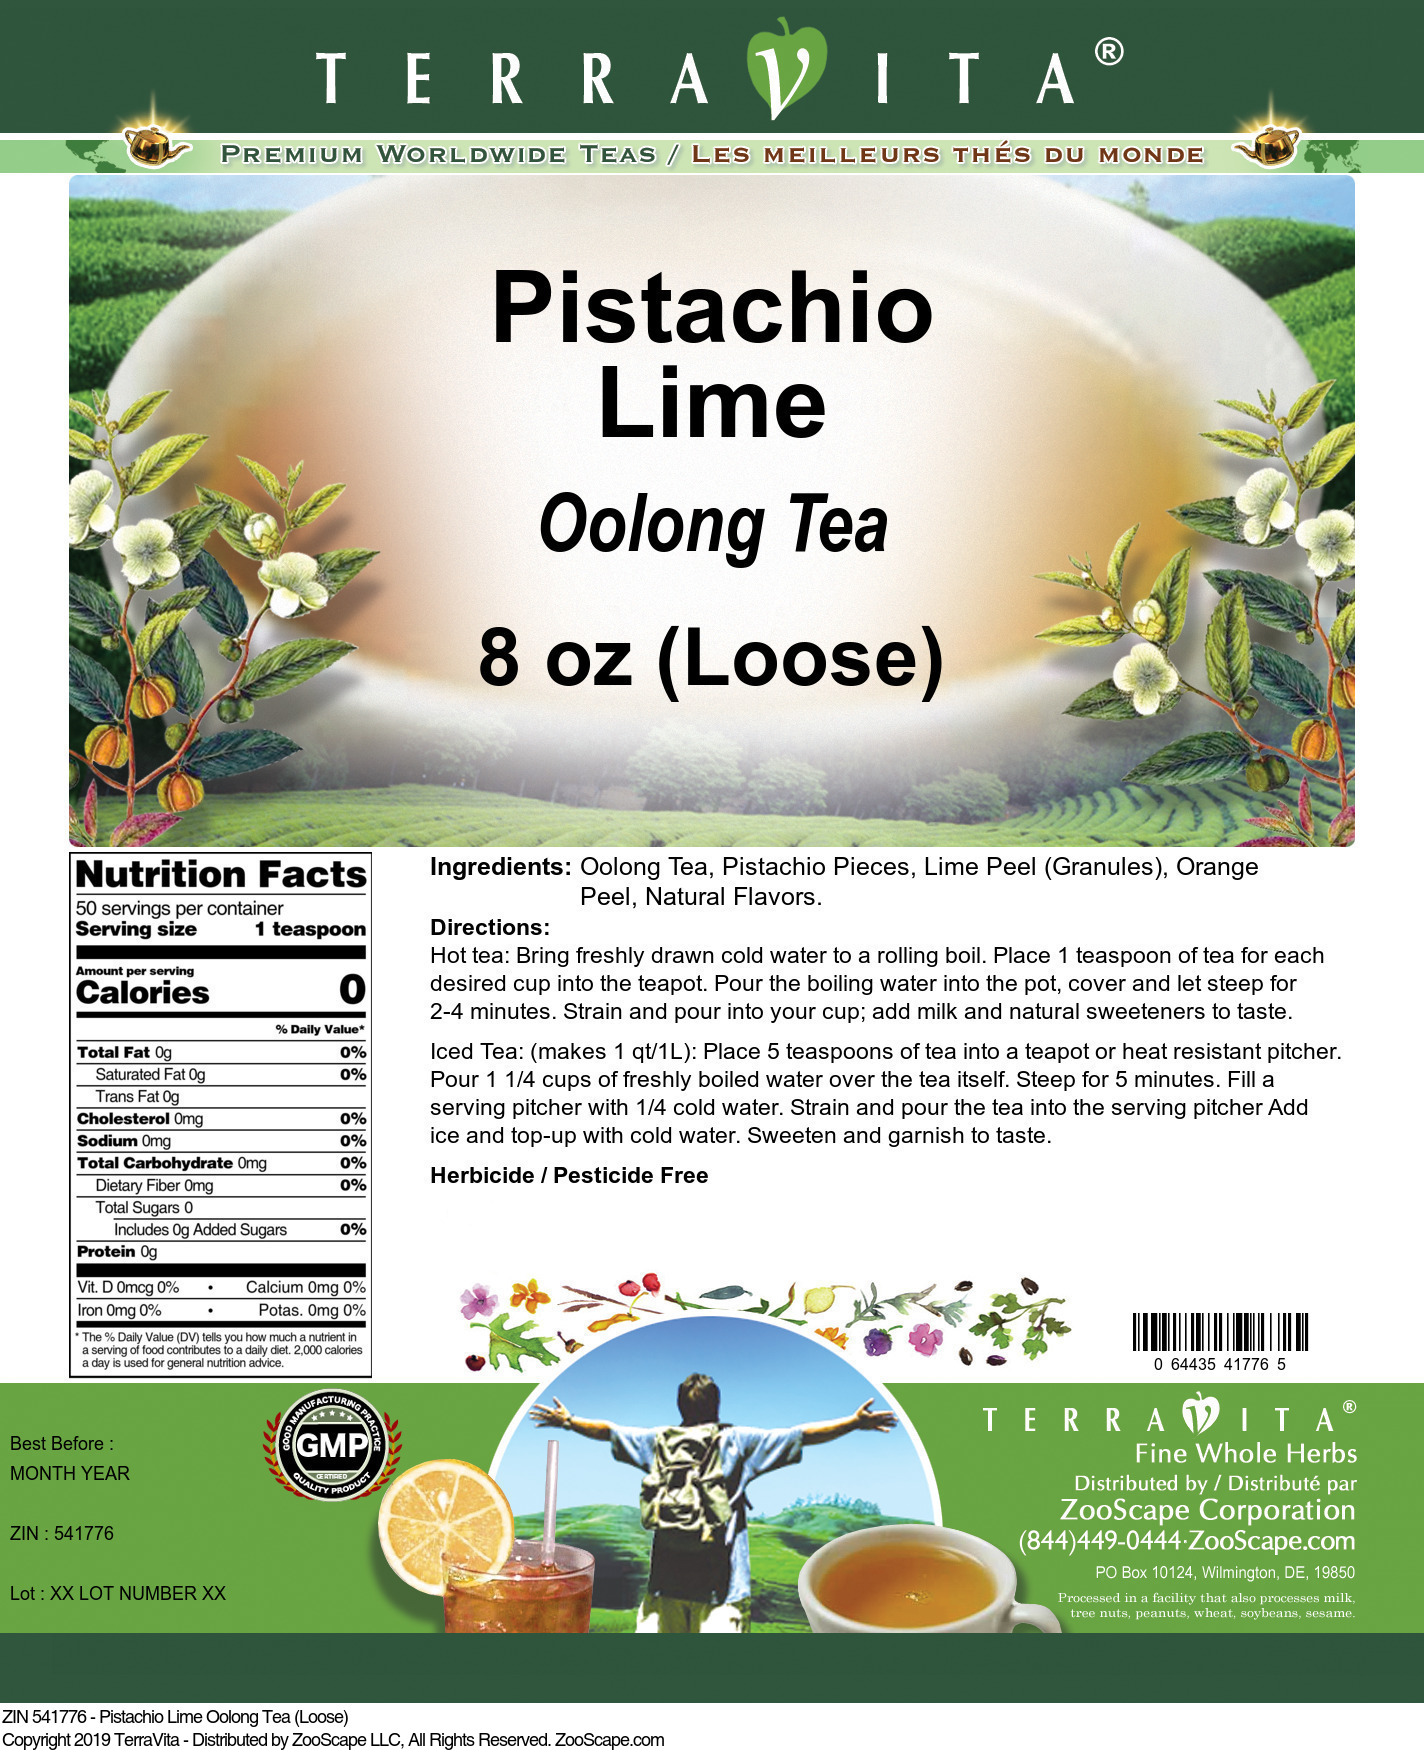 Pistachio Lime Oolong Tea (Loose)